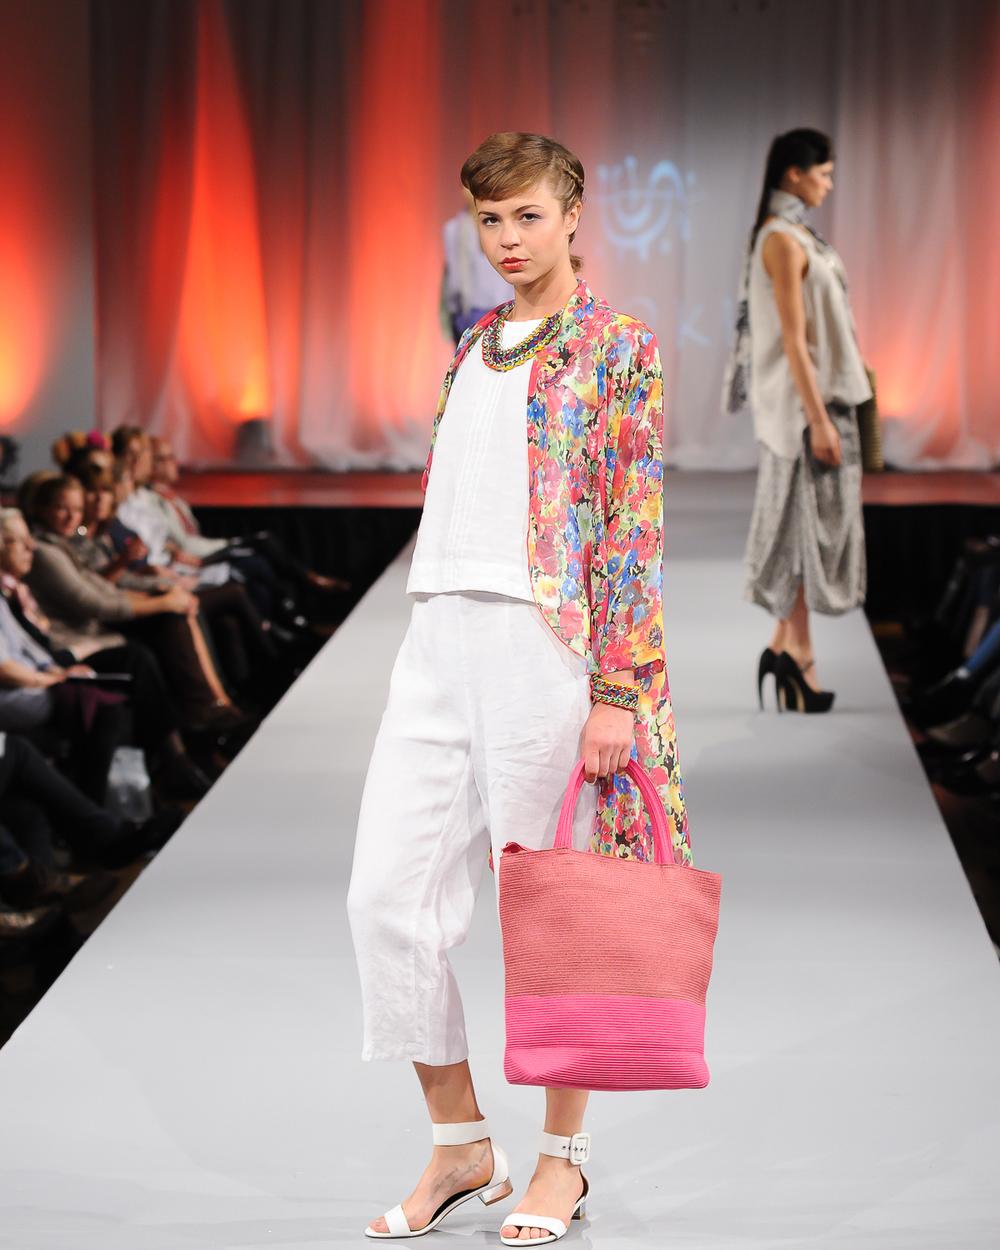 bristol-fashion-photographer-2.jpg